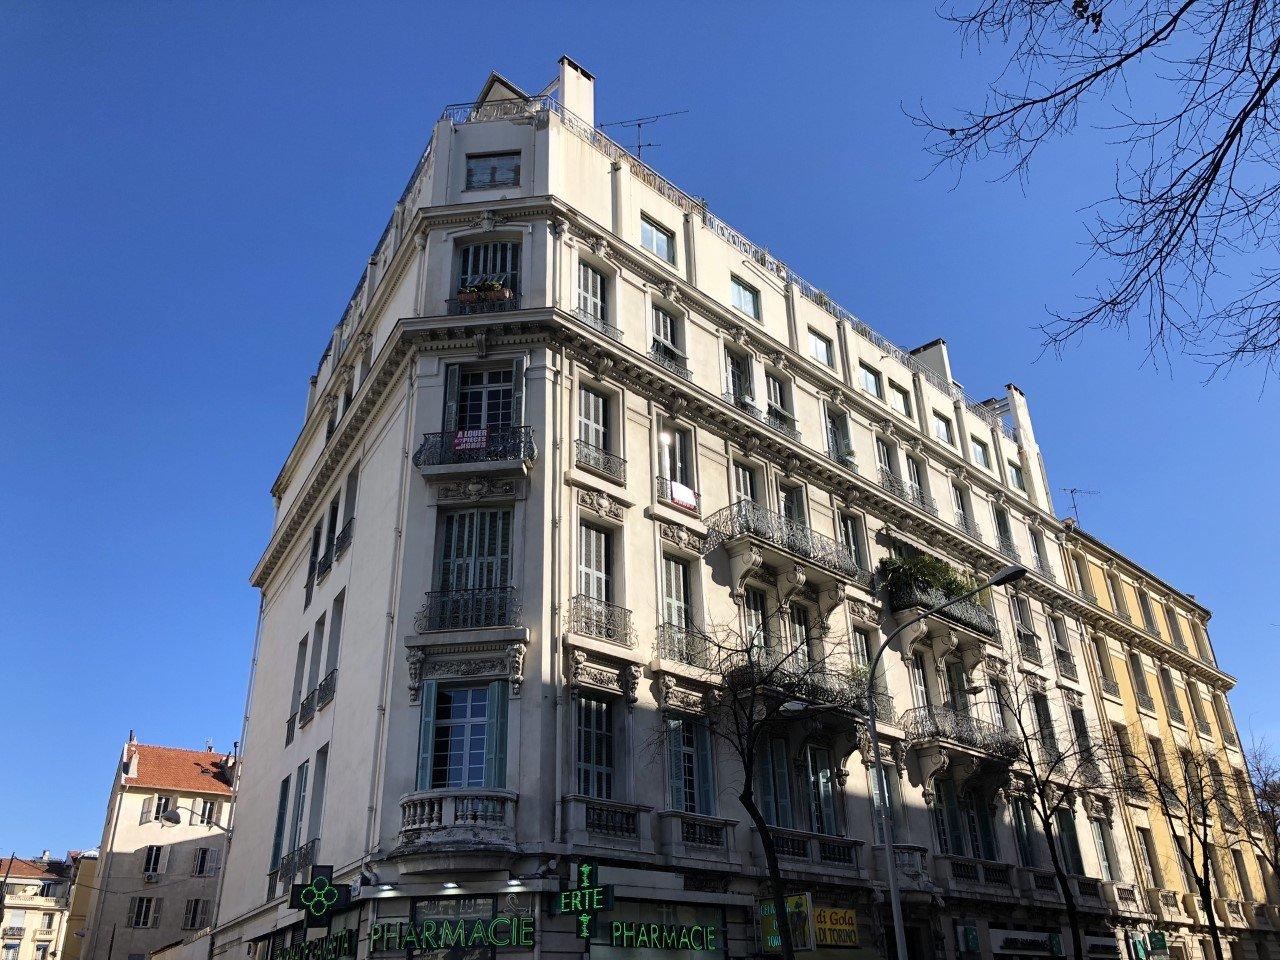 4 P Renovated - Nice Gambetta/Alsace Lorraine